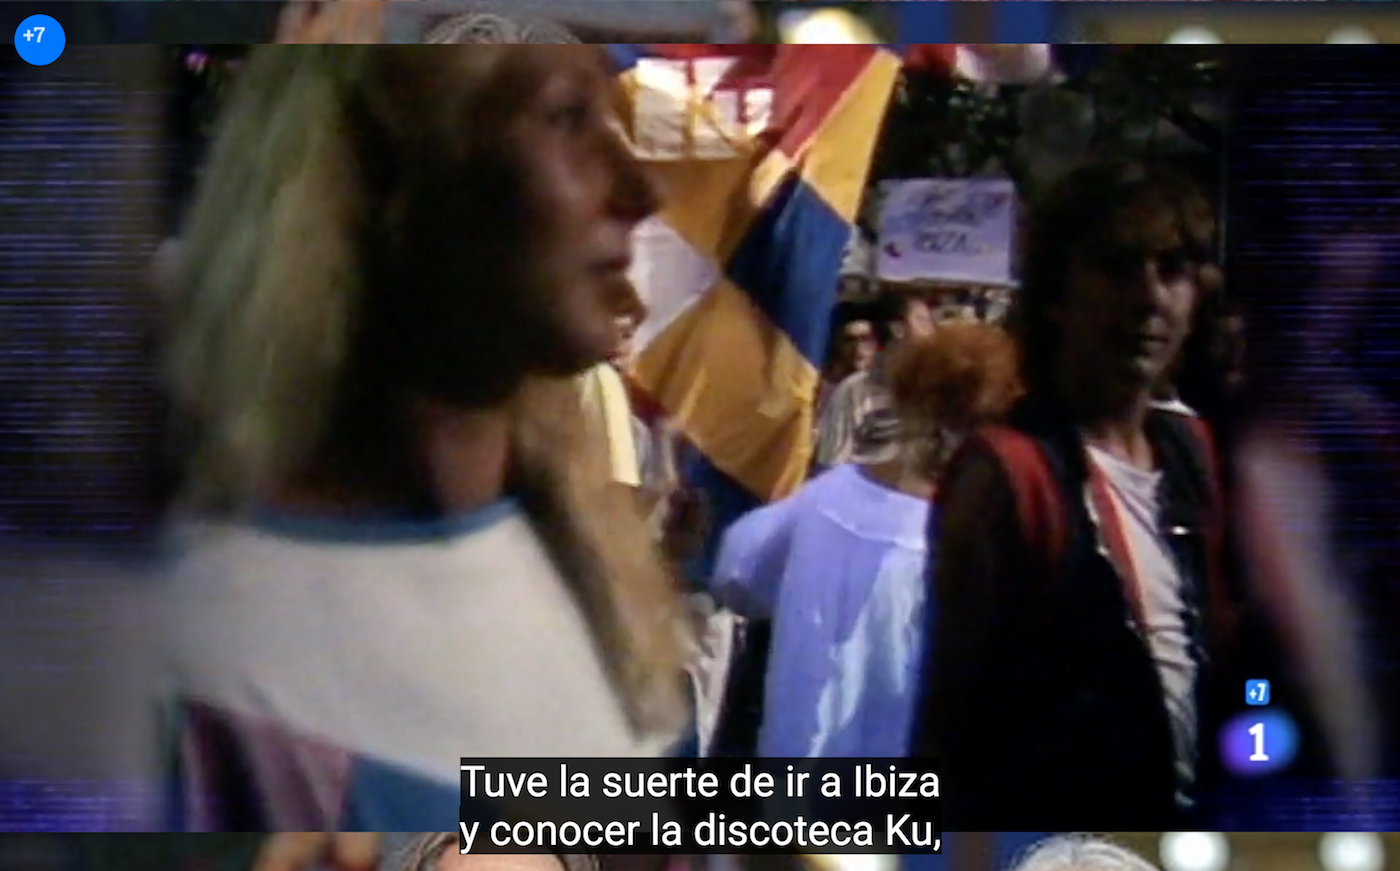 Ibiza Was A Party, Documentry, Ku, Ibiza, Amnesia, Spanish, Test Pressing